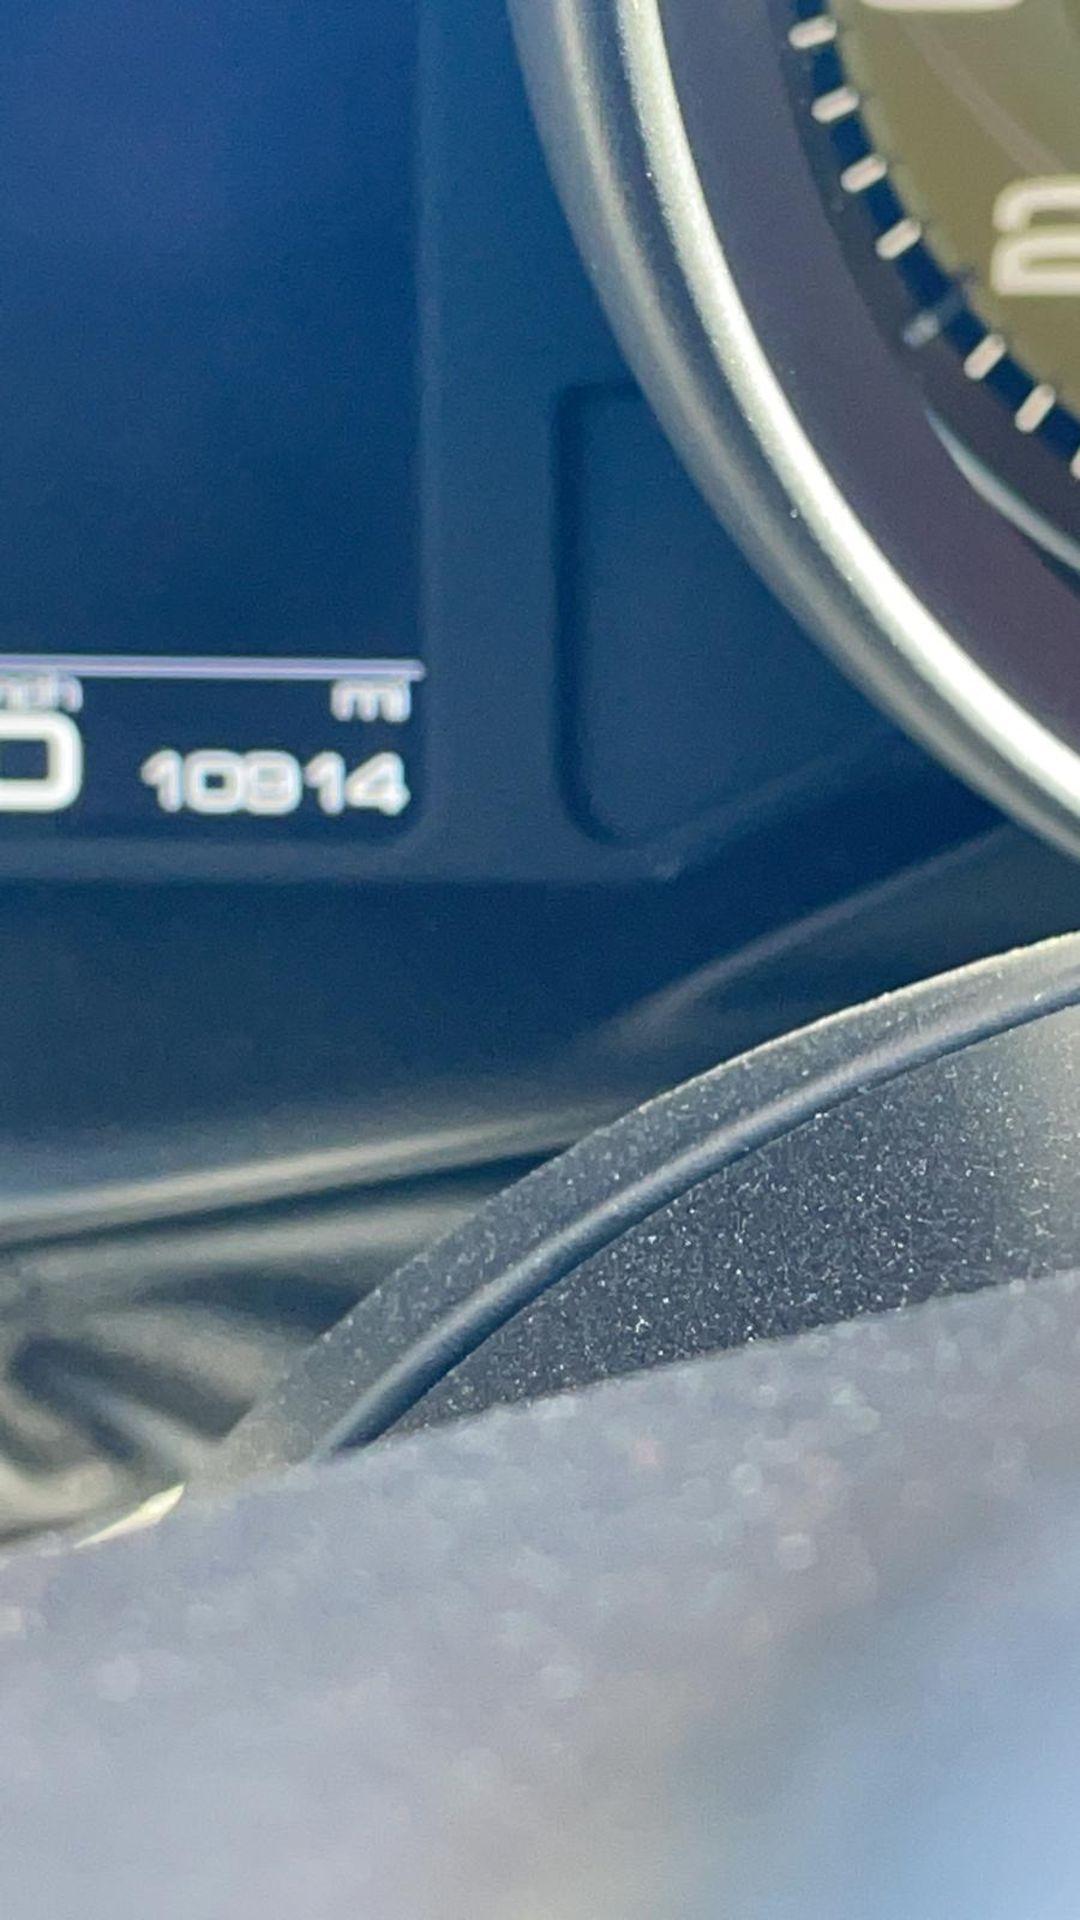 2016 FERRARI 488 GTB 2DR RED COUPE, PETROL, AUTOMATIC, 11K MILES, LEFT HAND DRIVE *NO VAT* - Image 22 of 22